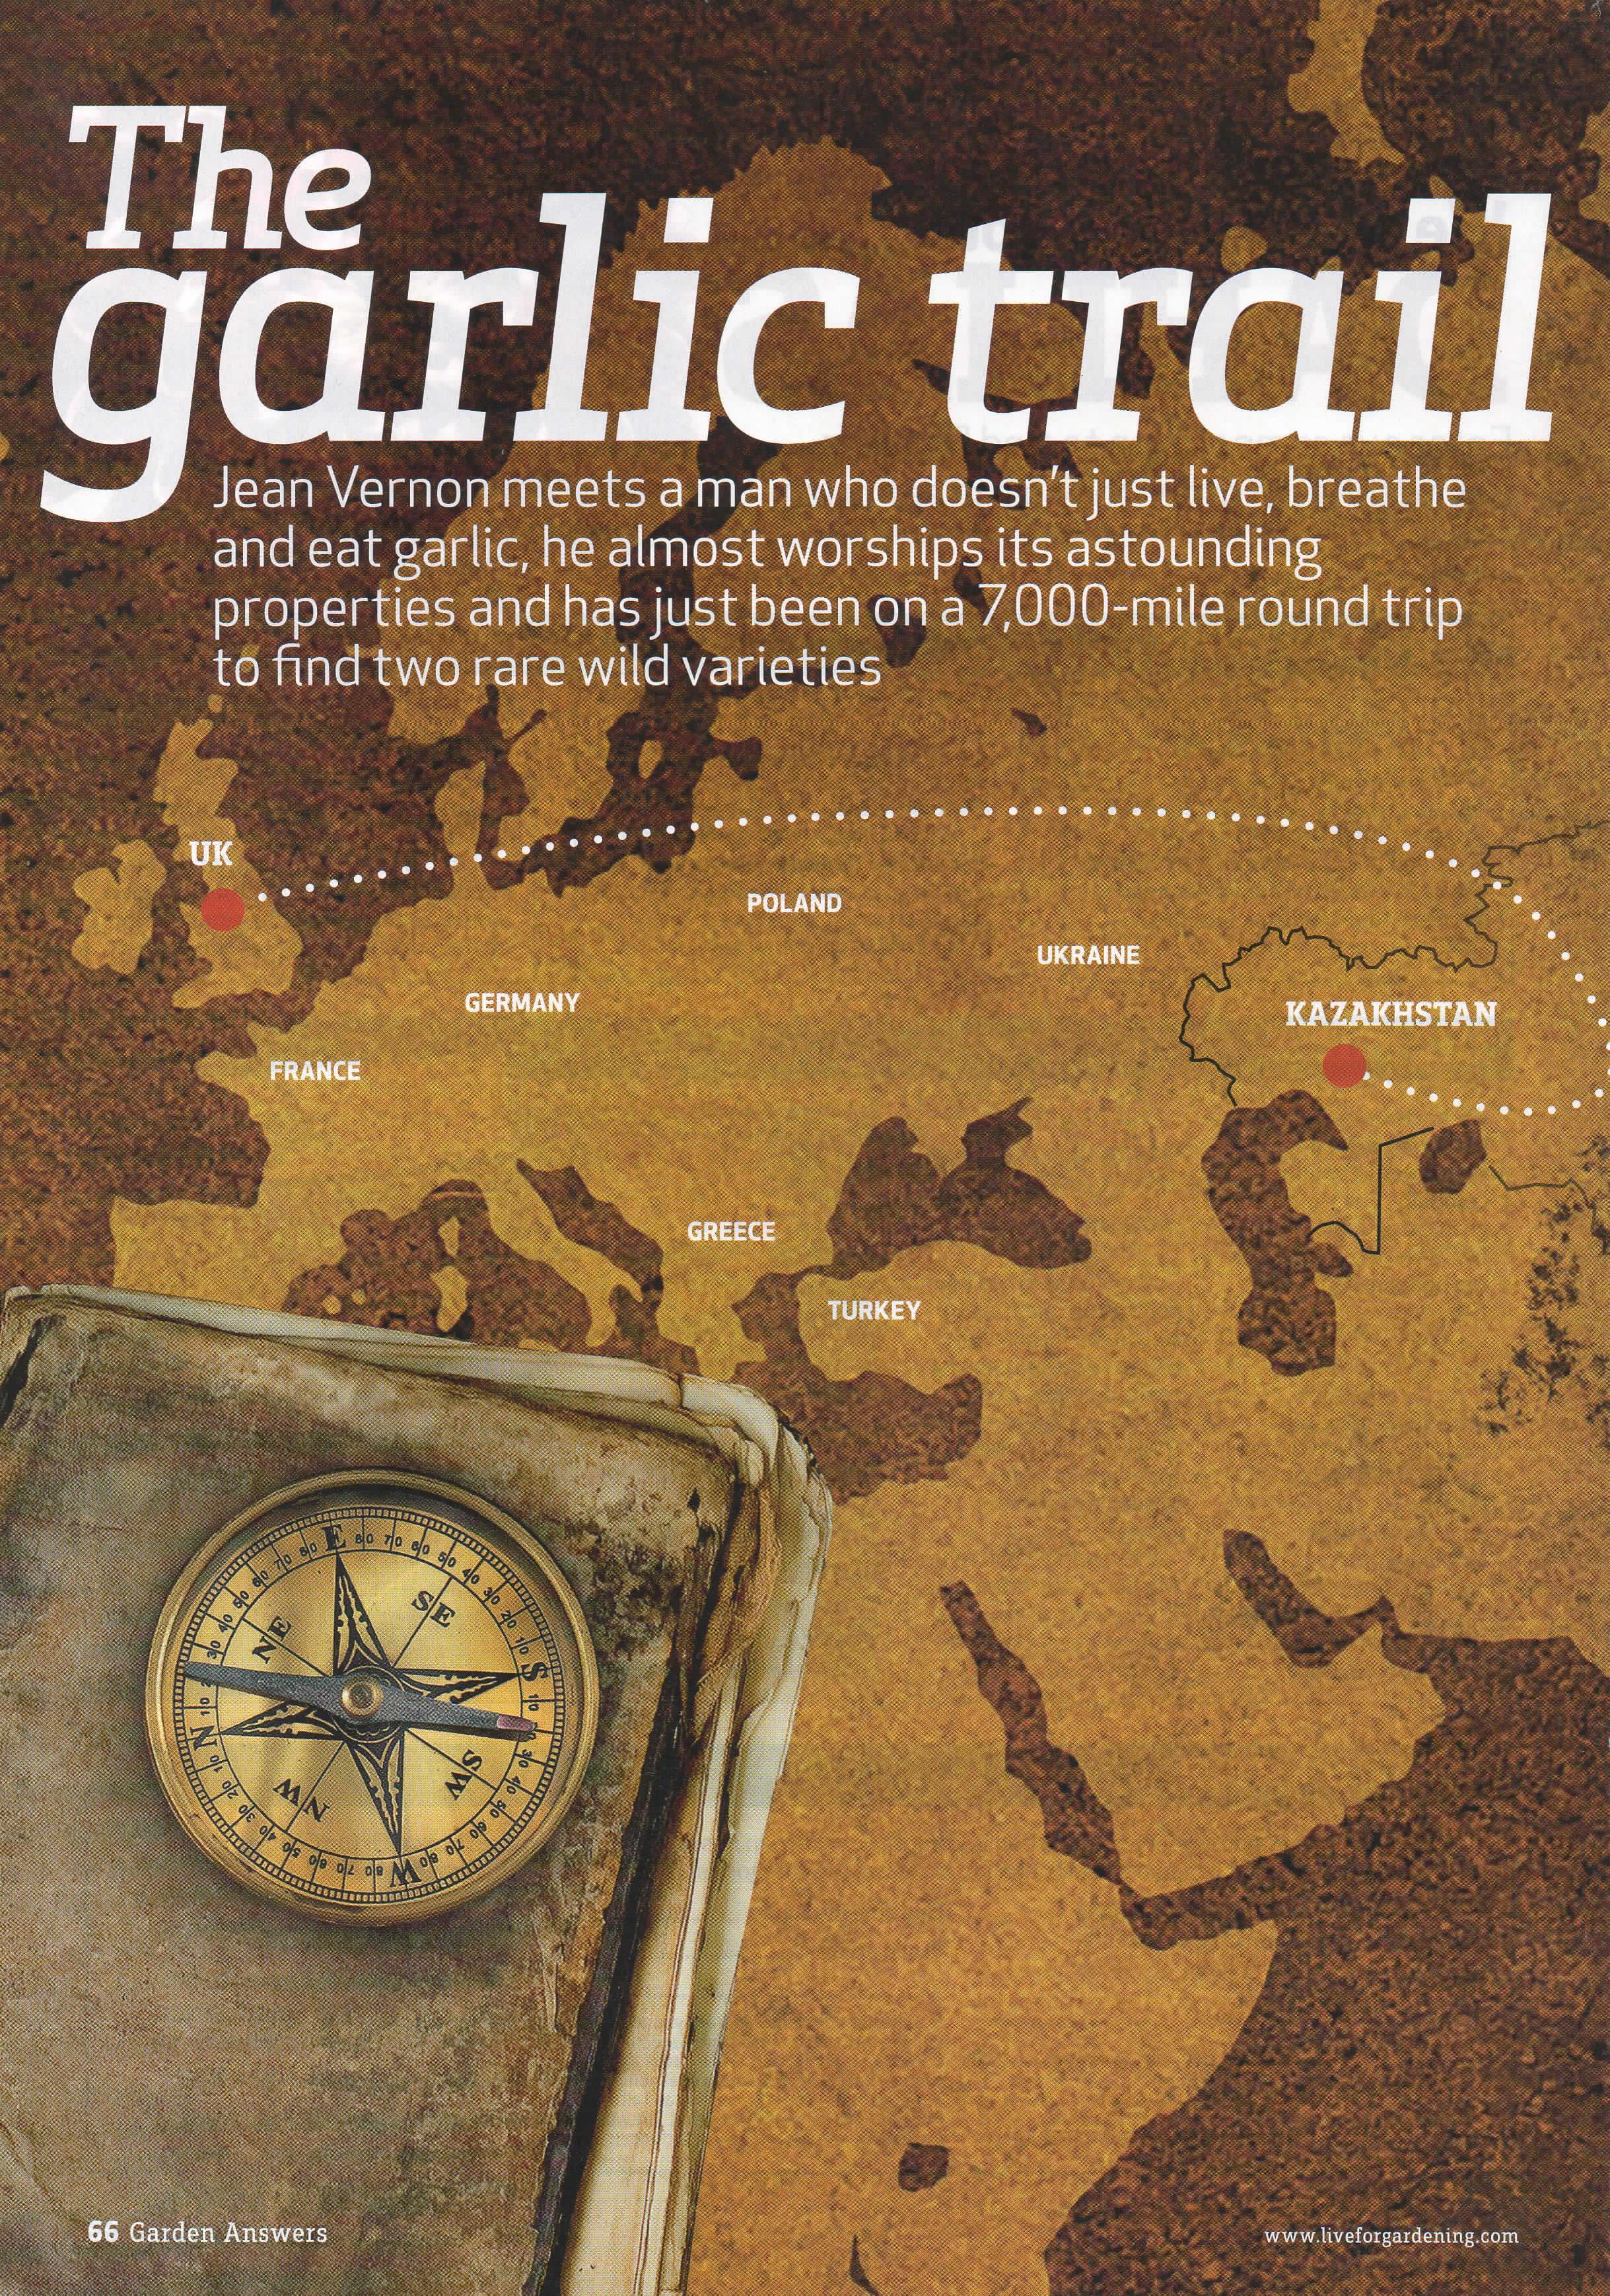 The Garlic Trail GA001-1.jpg